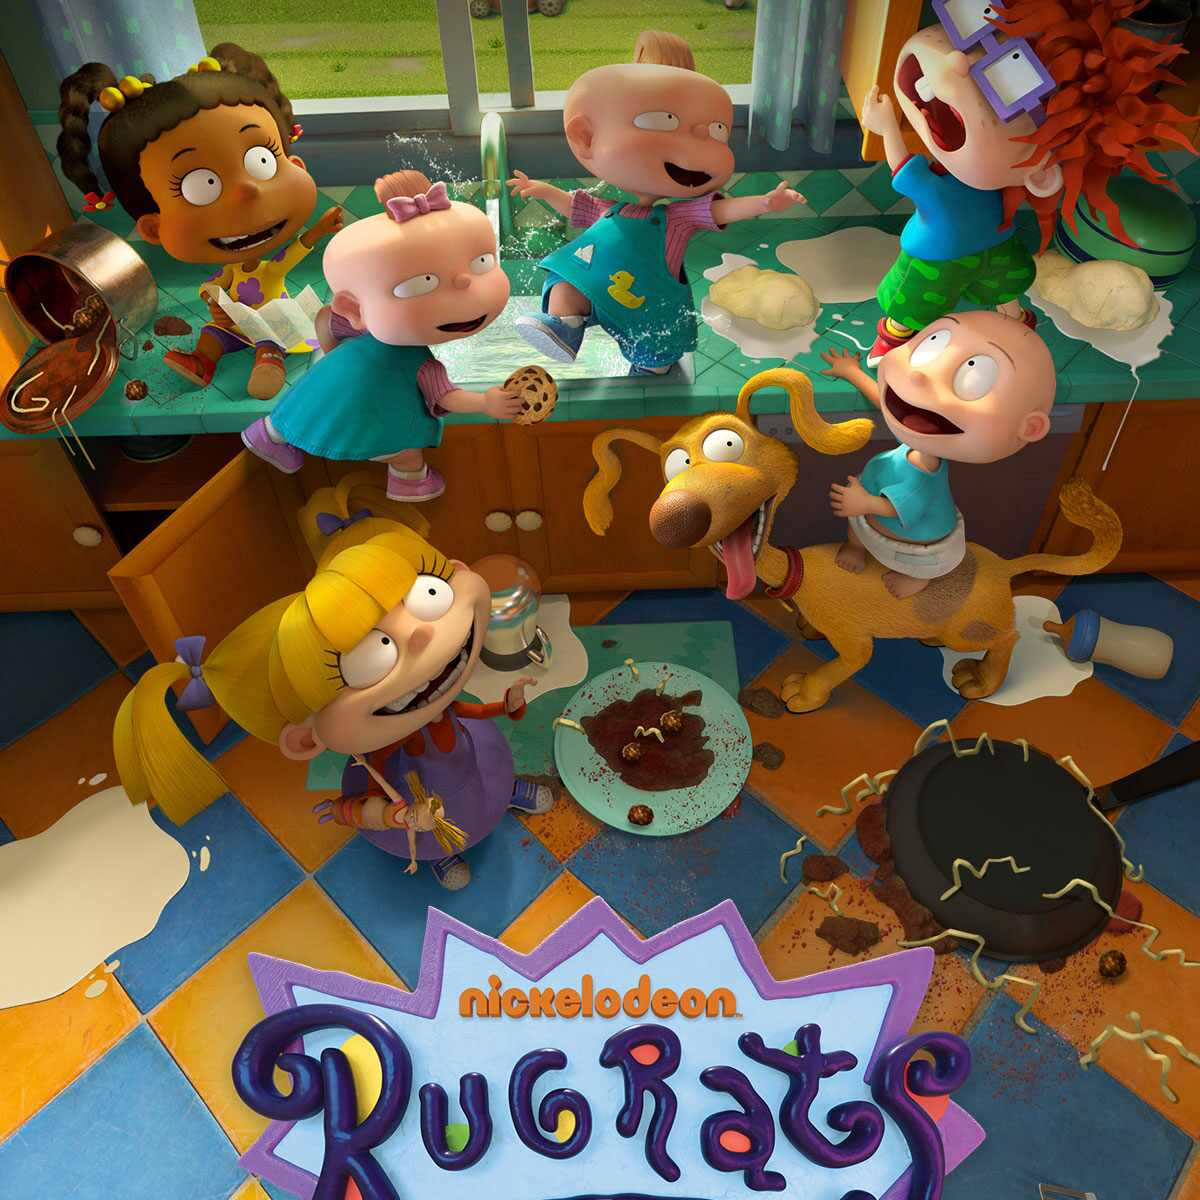 Rugrats, Paramount+, Key Art,